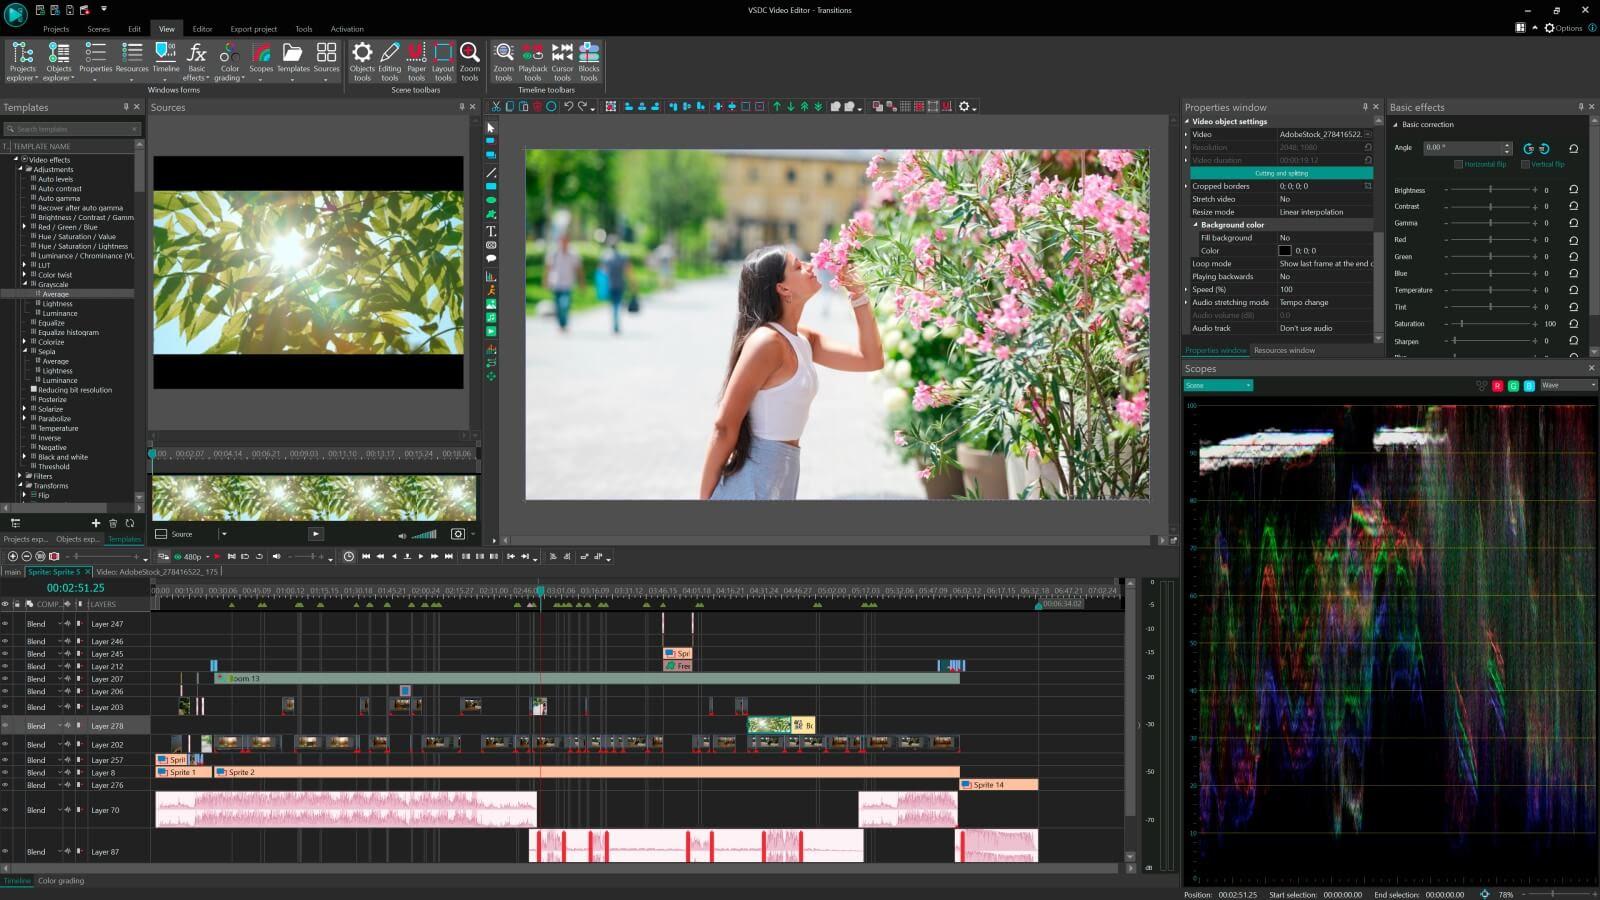 VSDC Pro NLE Video Editor 5.5